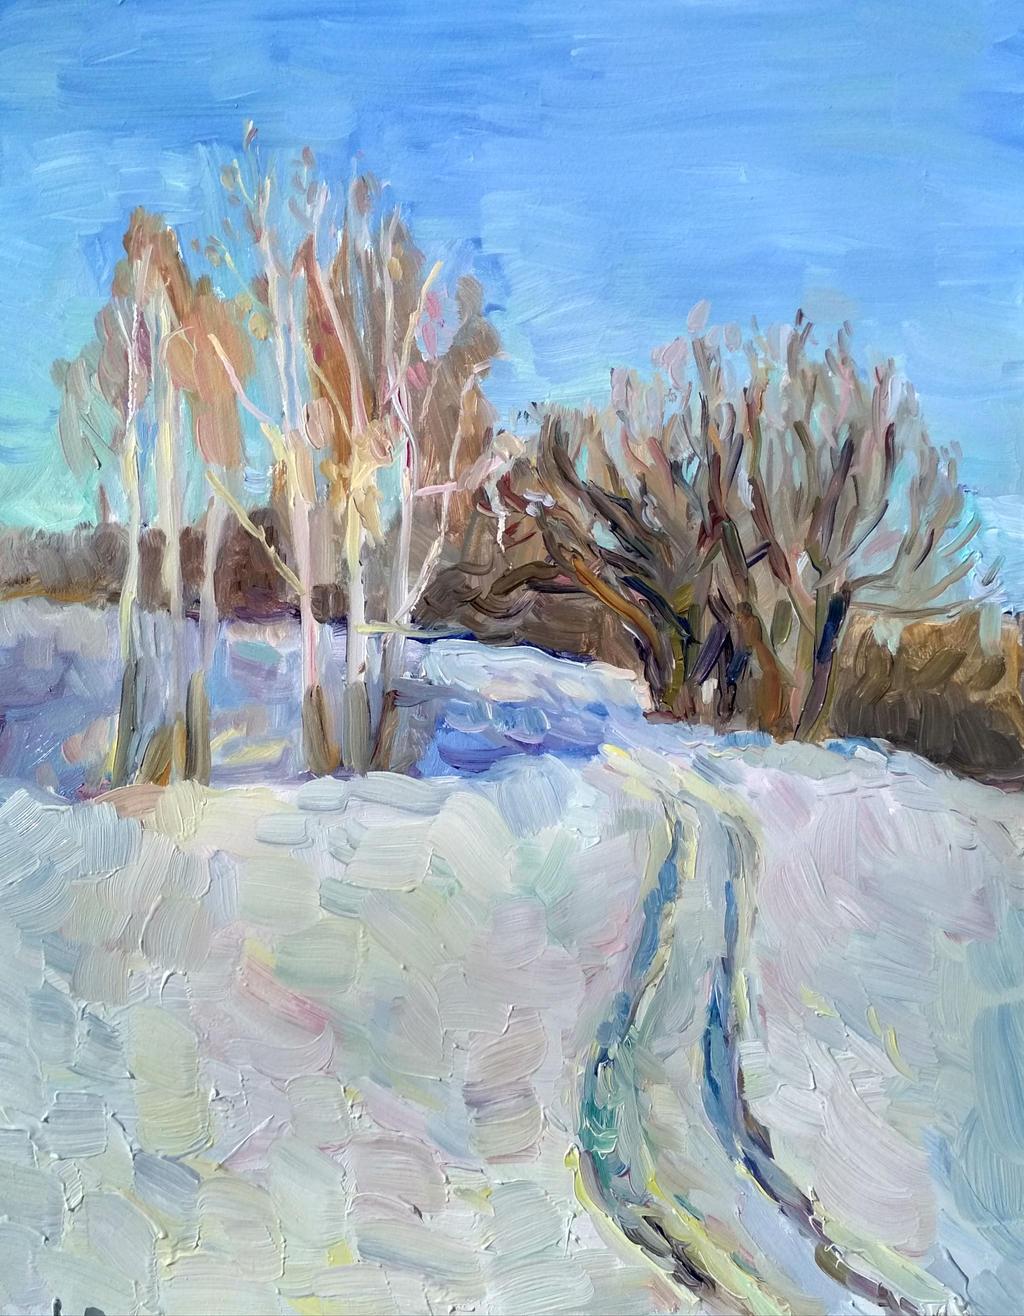 Winter trail by sergey-ptica